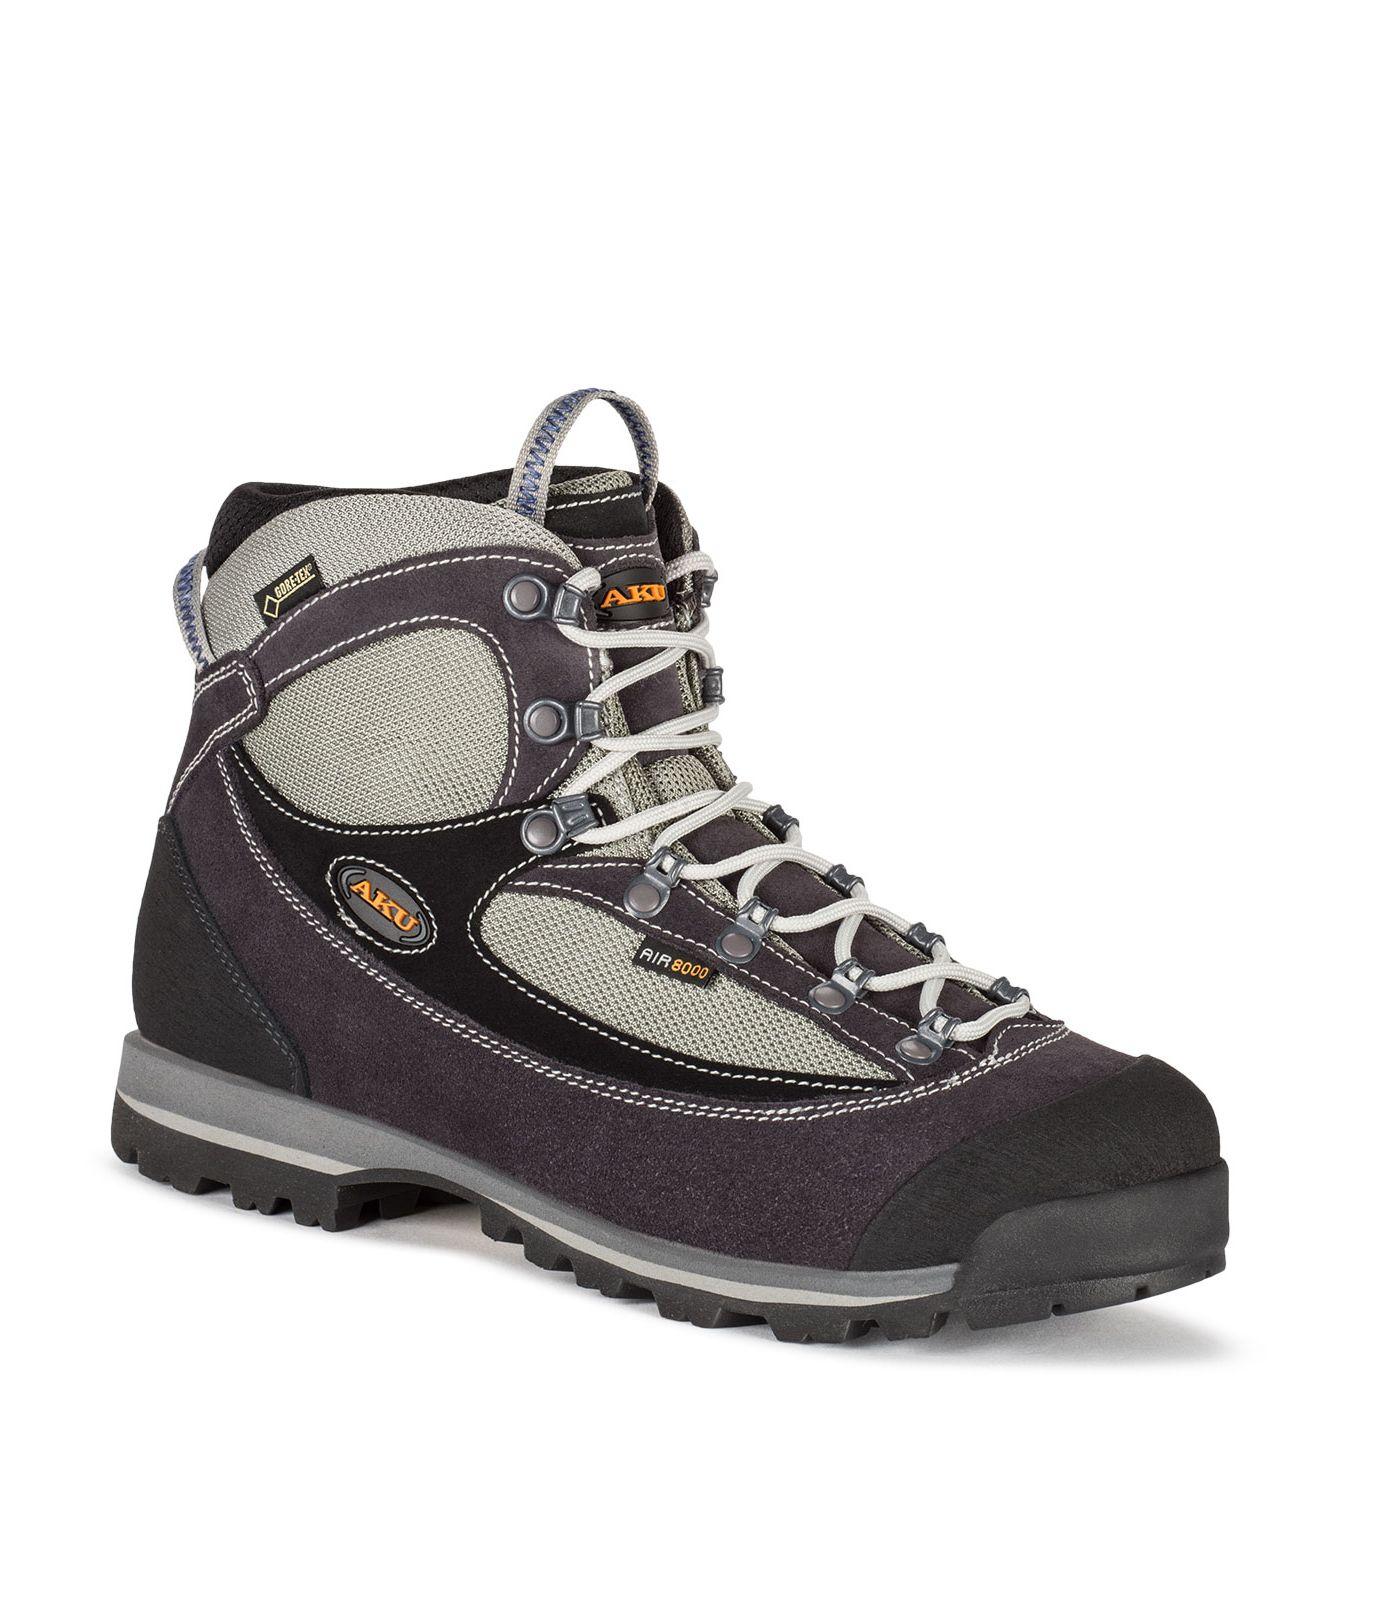 Gore De Randonnee Femme1 Chaussures Trekker Tex Doublees Lite Gtx 8nkXN0OPZw